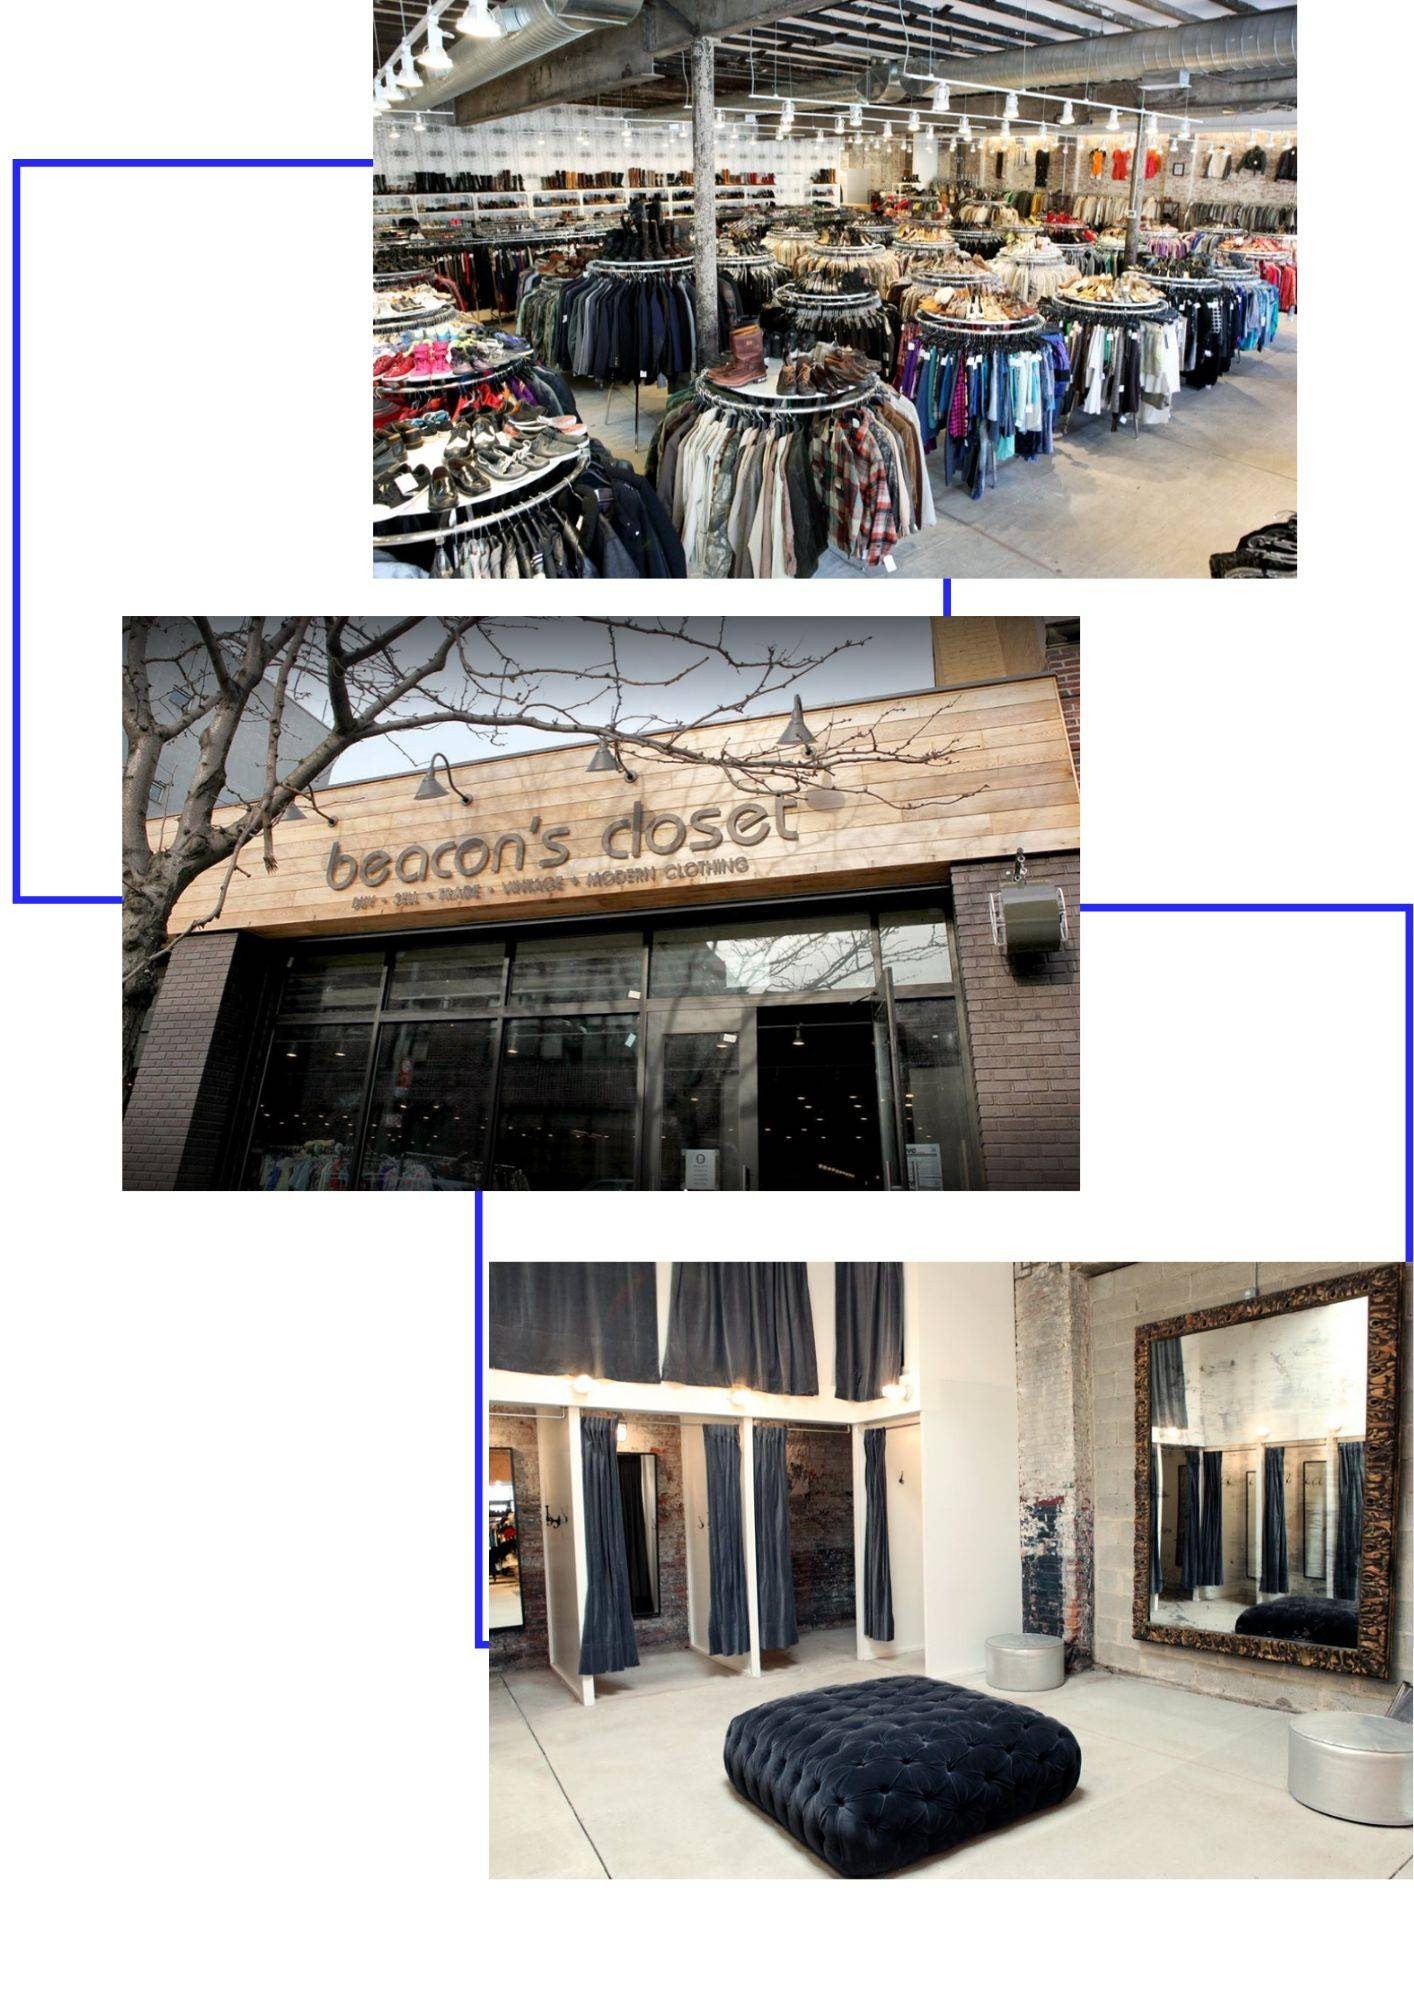 beacon's closet friperie new york